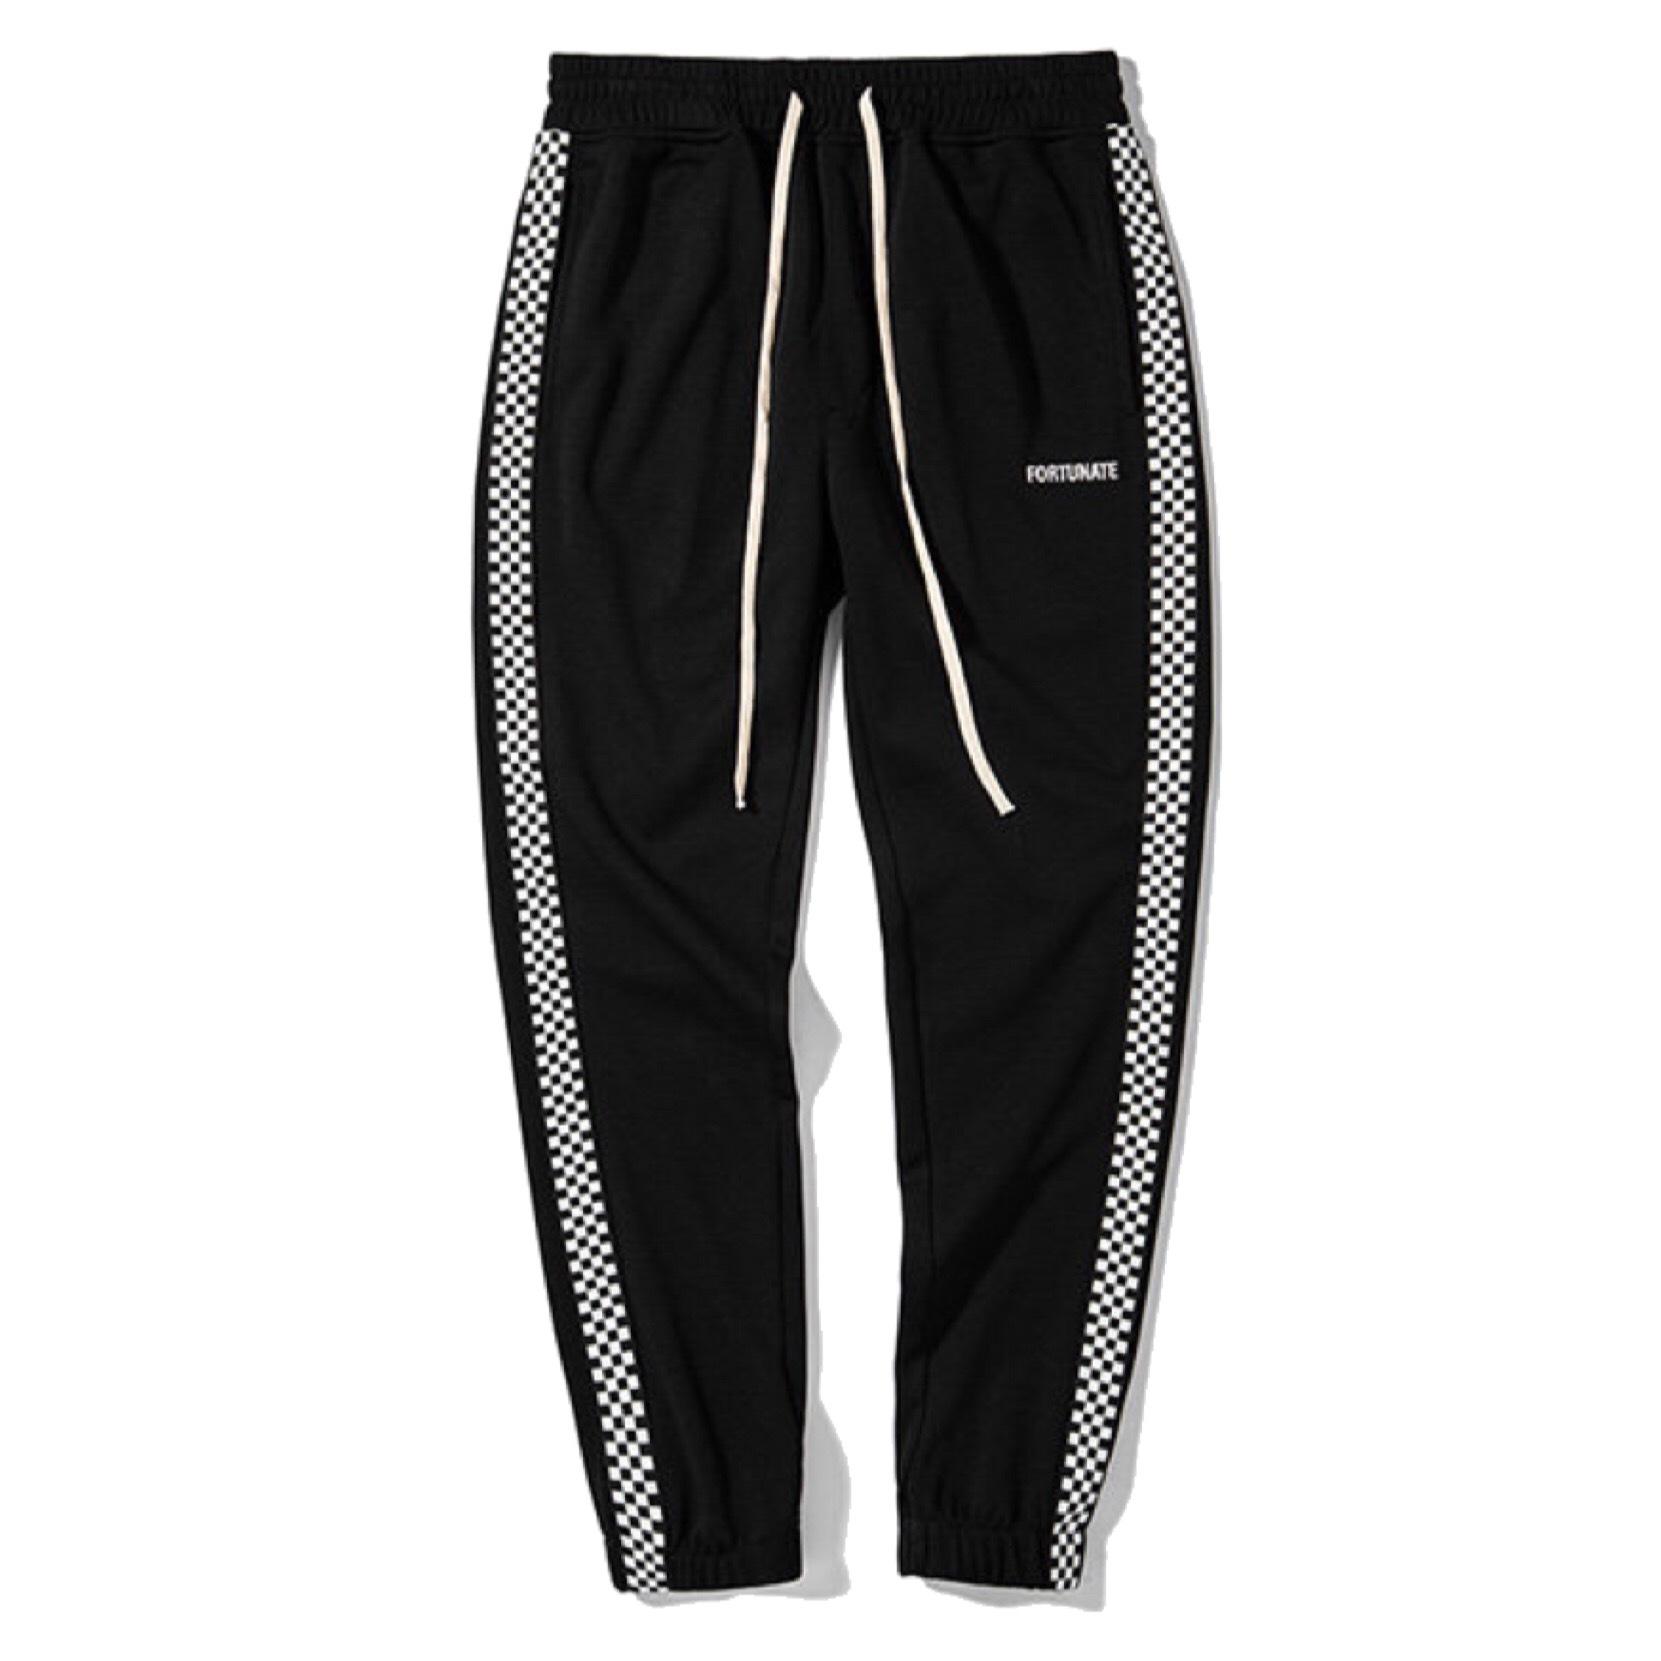 Sideline pants